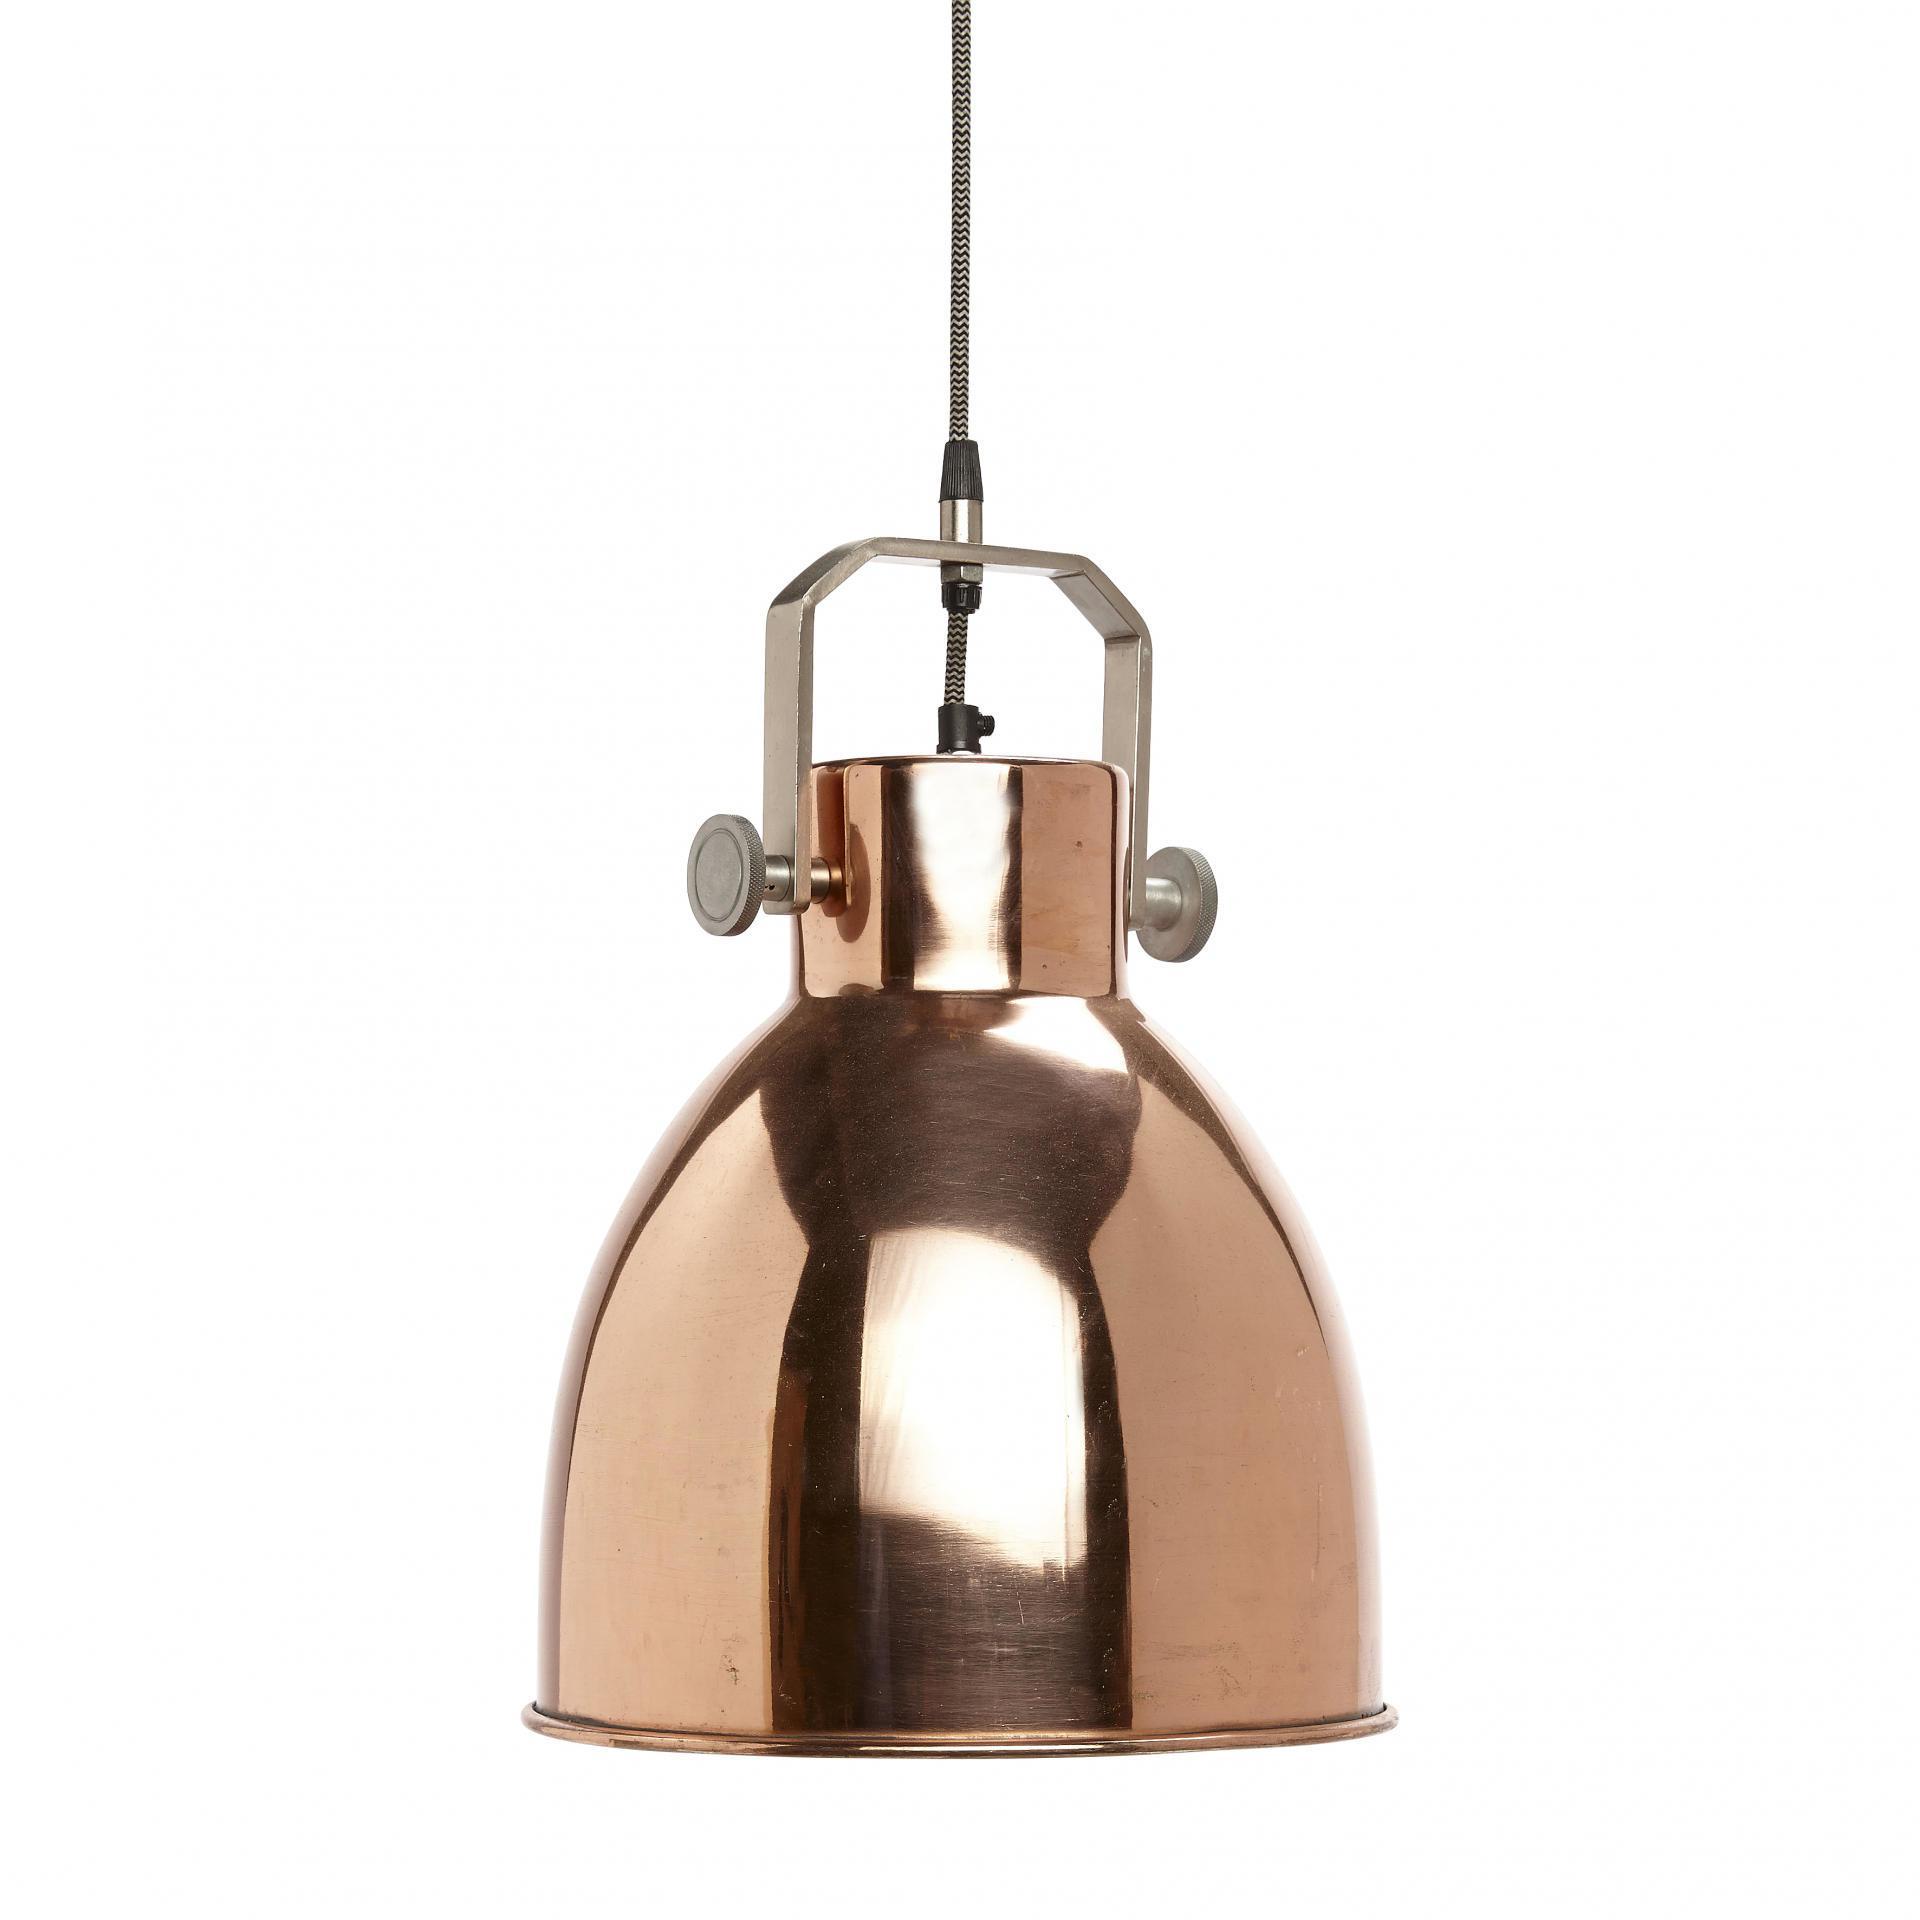 Hübsch Závěsná lampa Copper industrial, měděná barva, kov